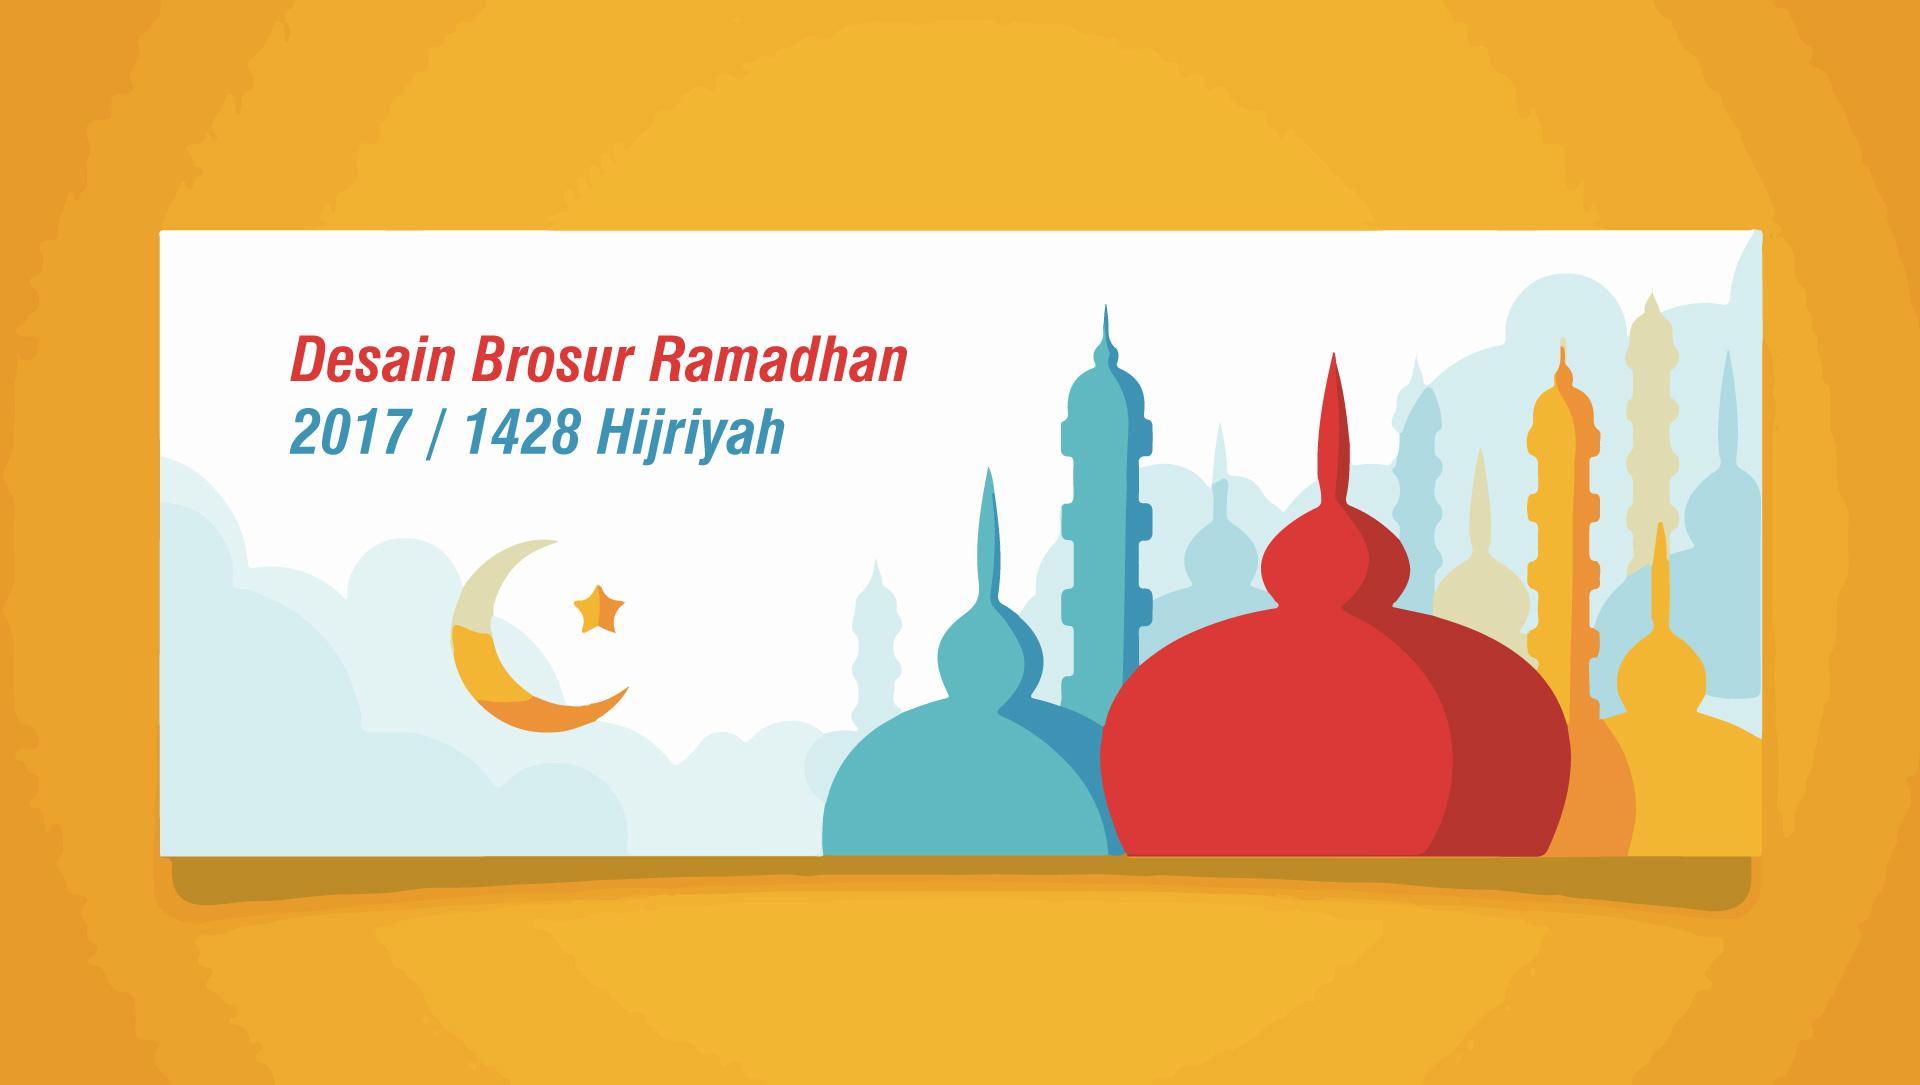 free-download-desain-brosur-ramadhan-2017-1438-hijriah